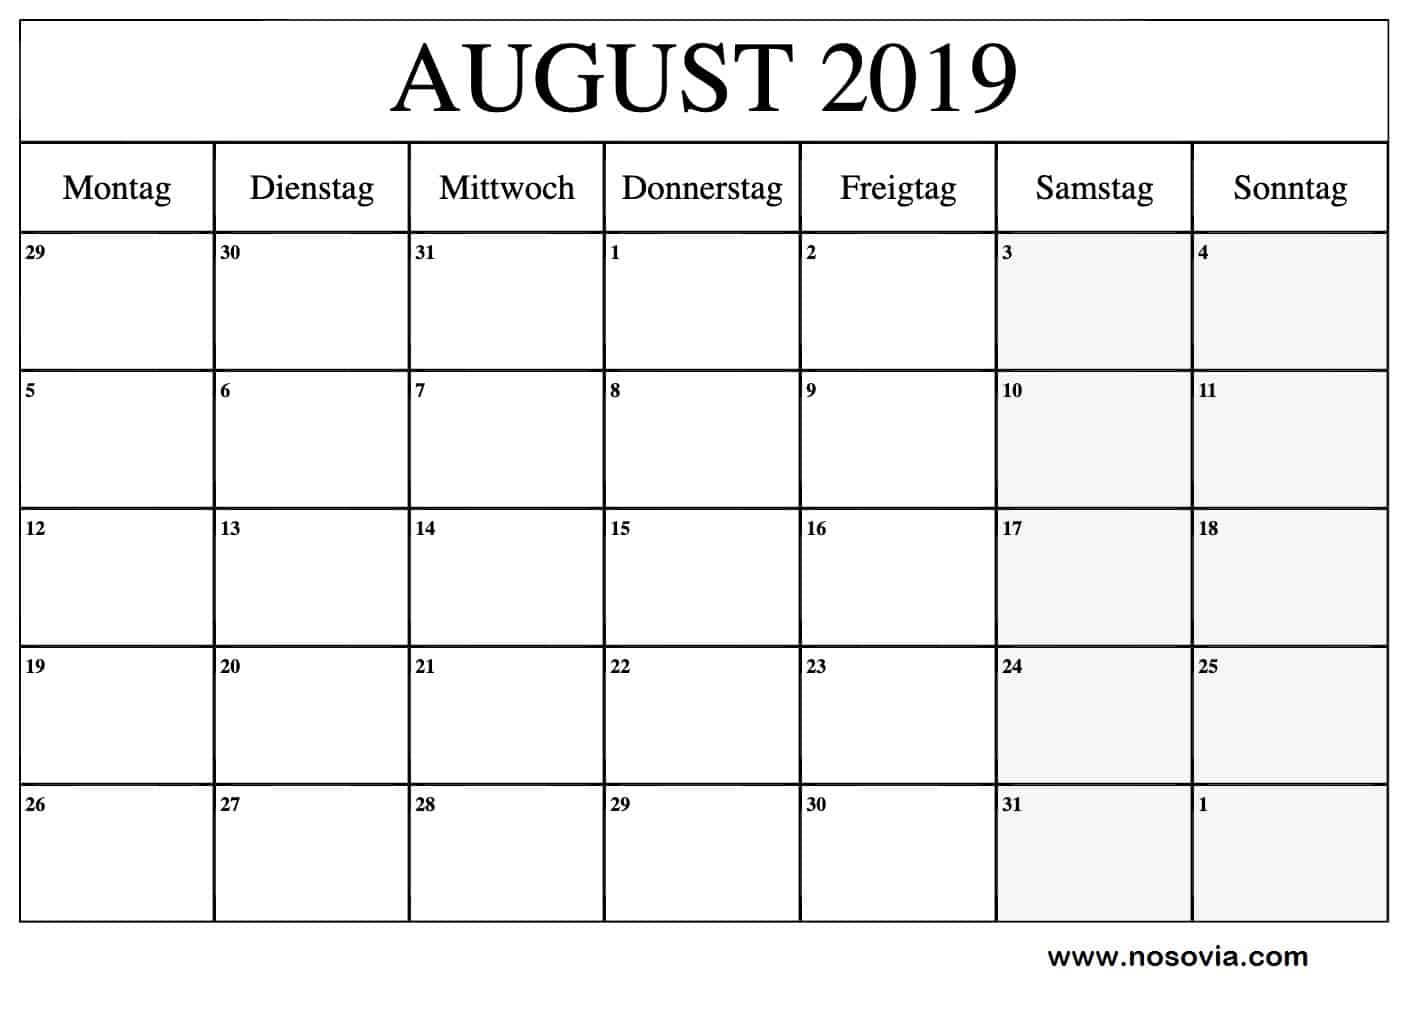 August 2019 Kalender Stile